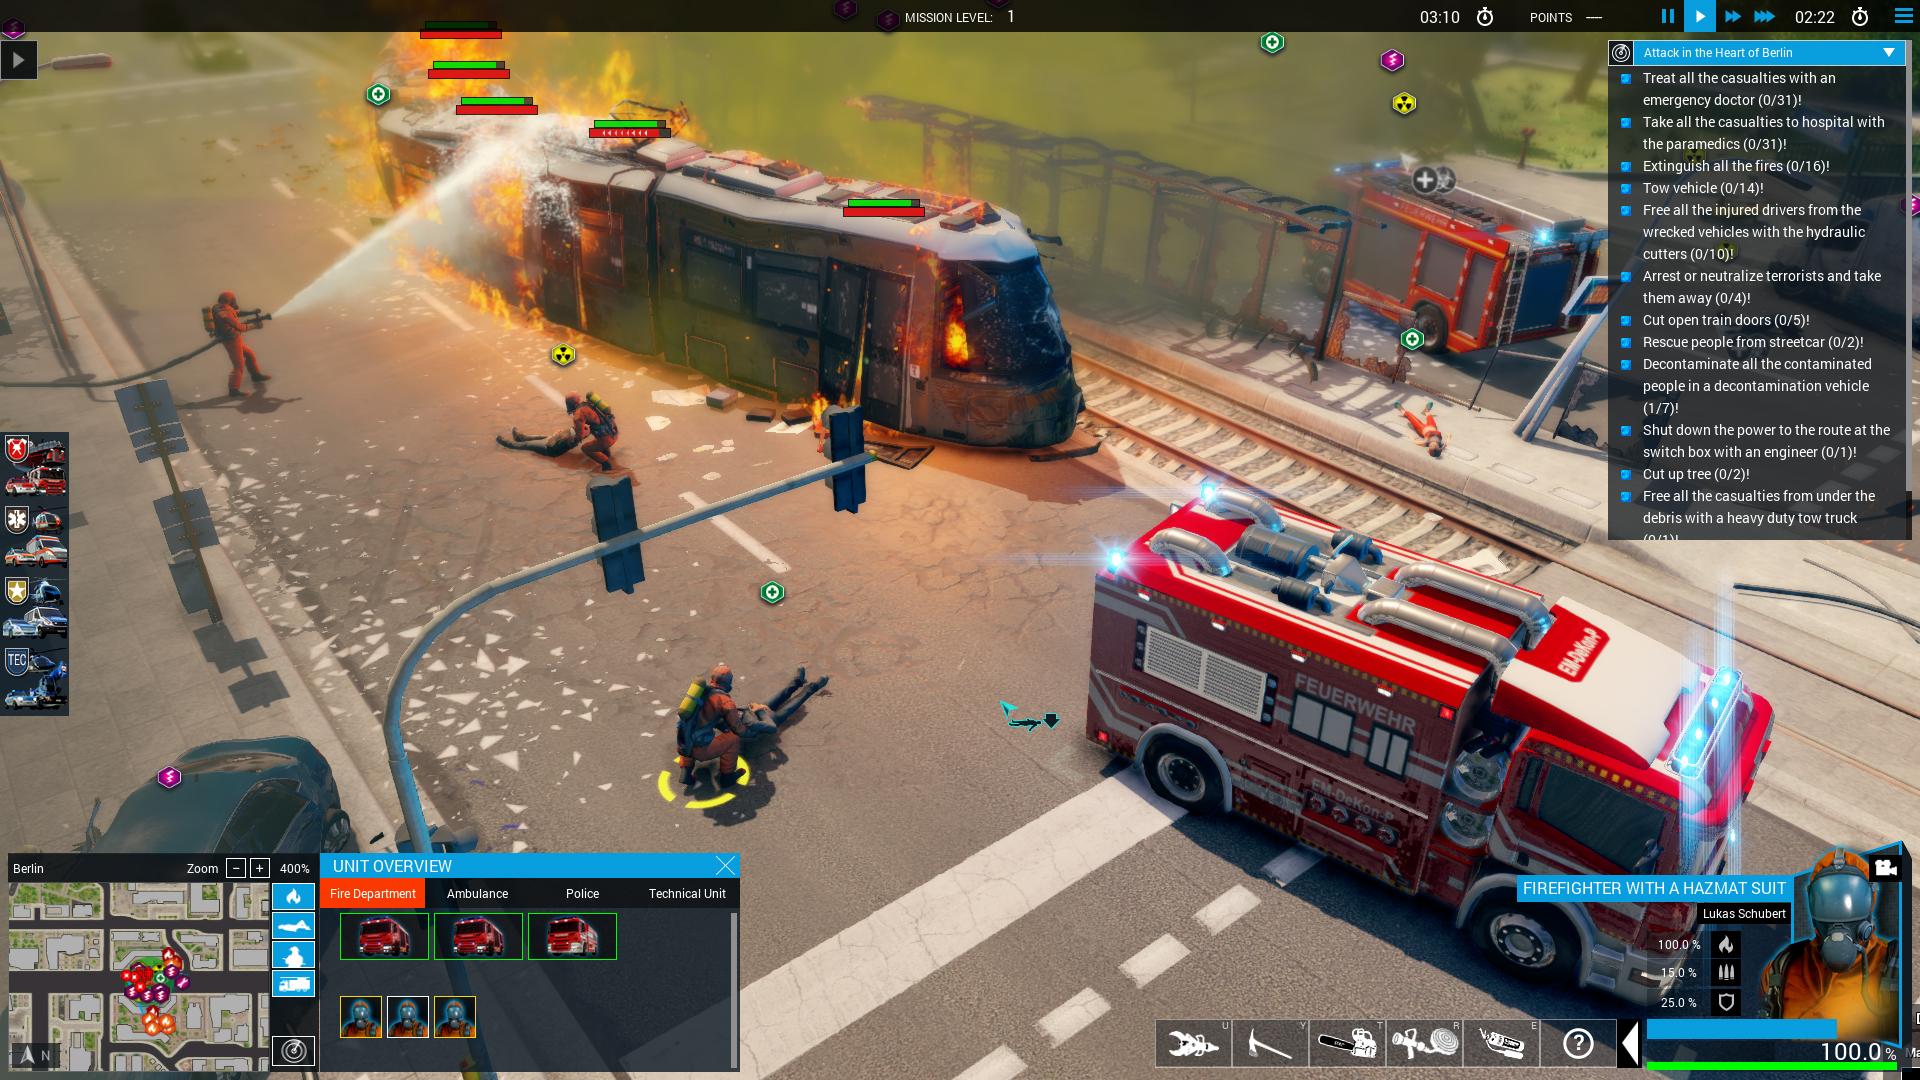 Emergency 2017 Screenshot 2